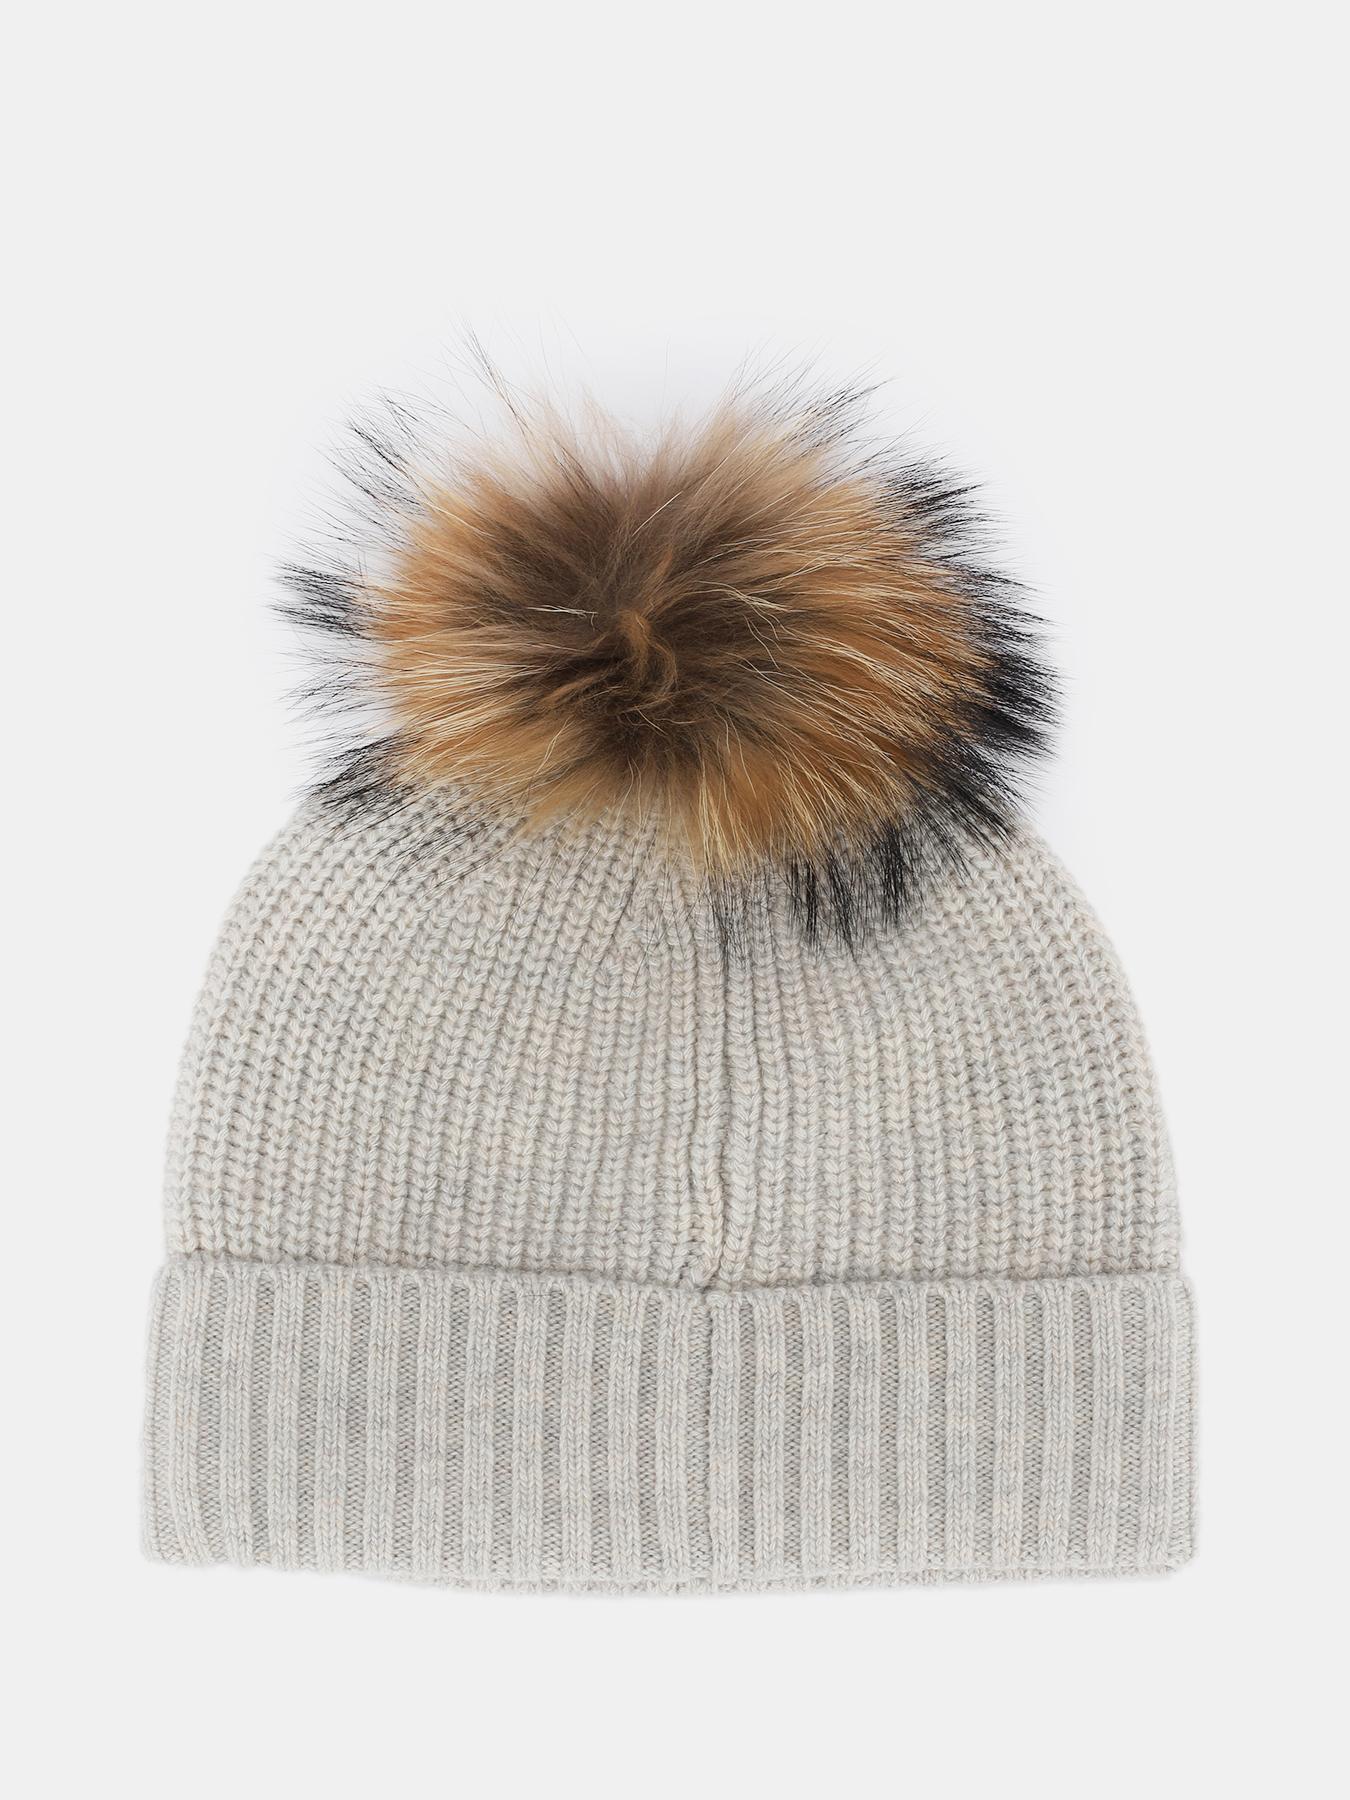 Шапка Finisterre Шапка с помпоном шапка fabretti шапка